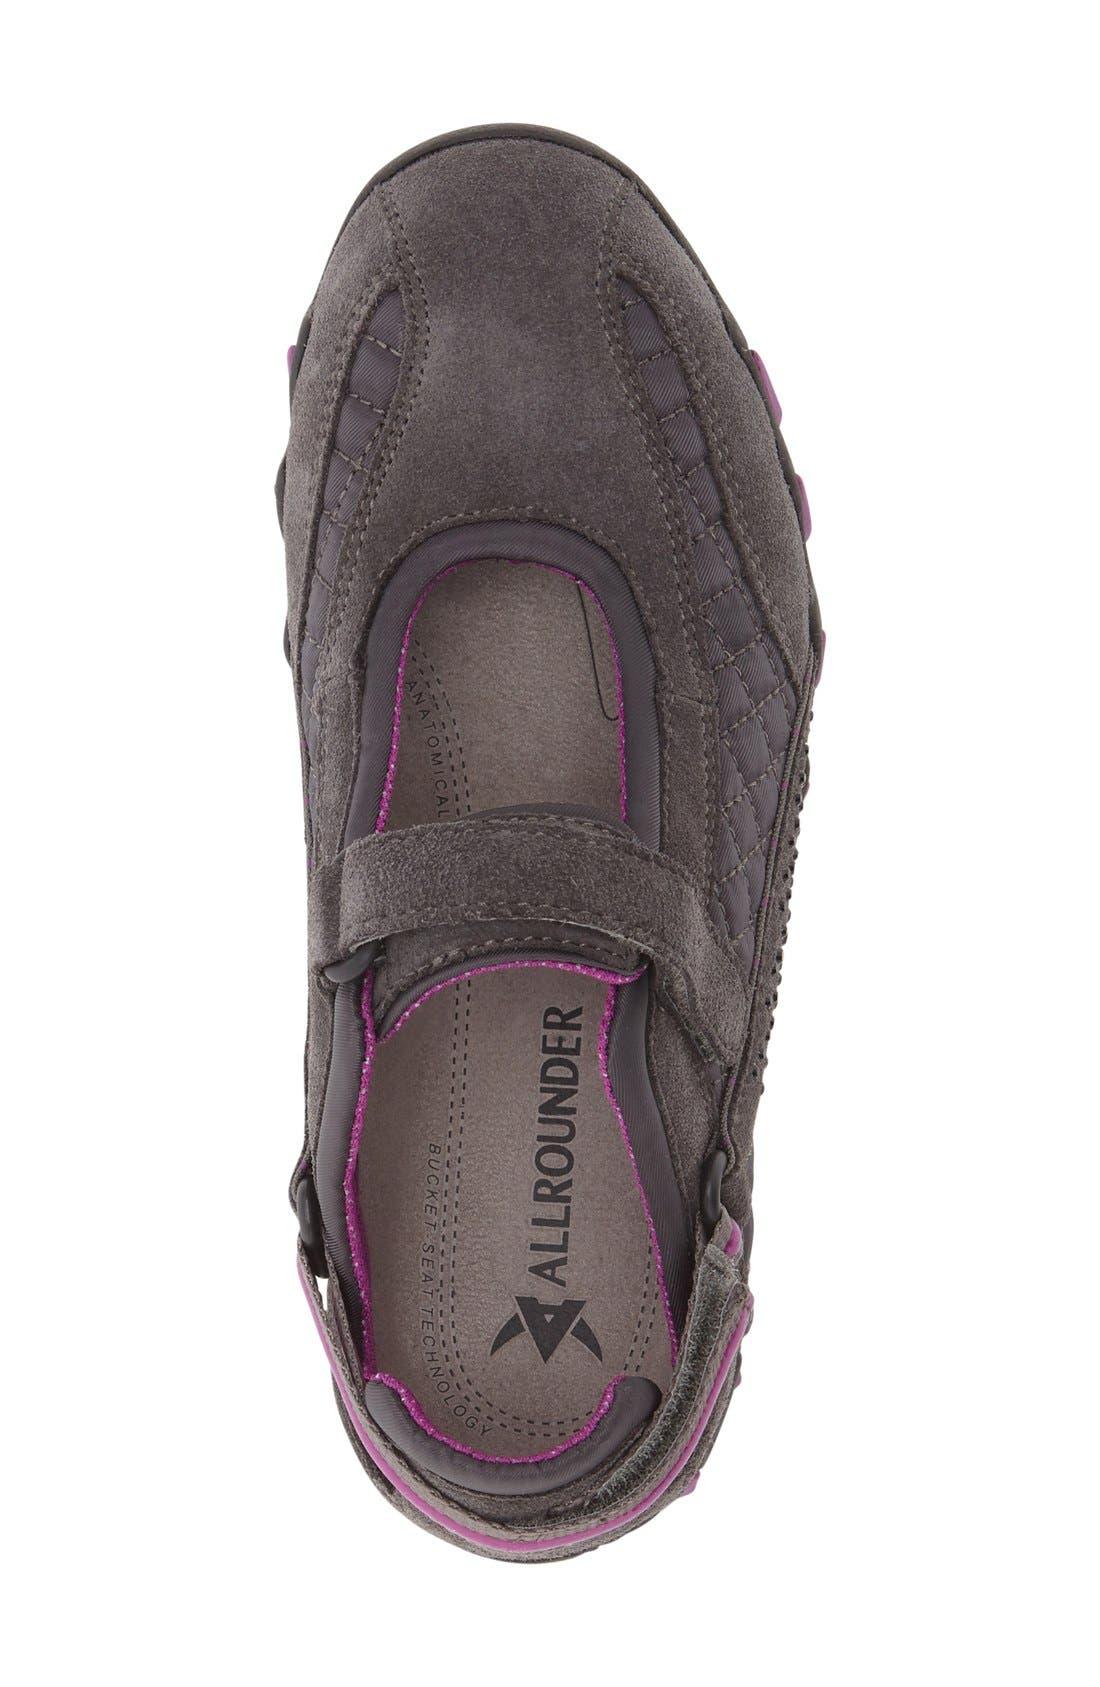 Alternate Image 3  - Allrounder by Mephisto 'Niro Diamonds' Sneaker (Women)